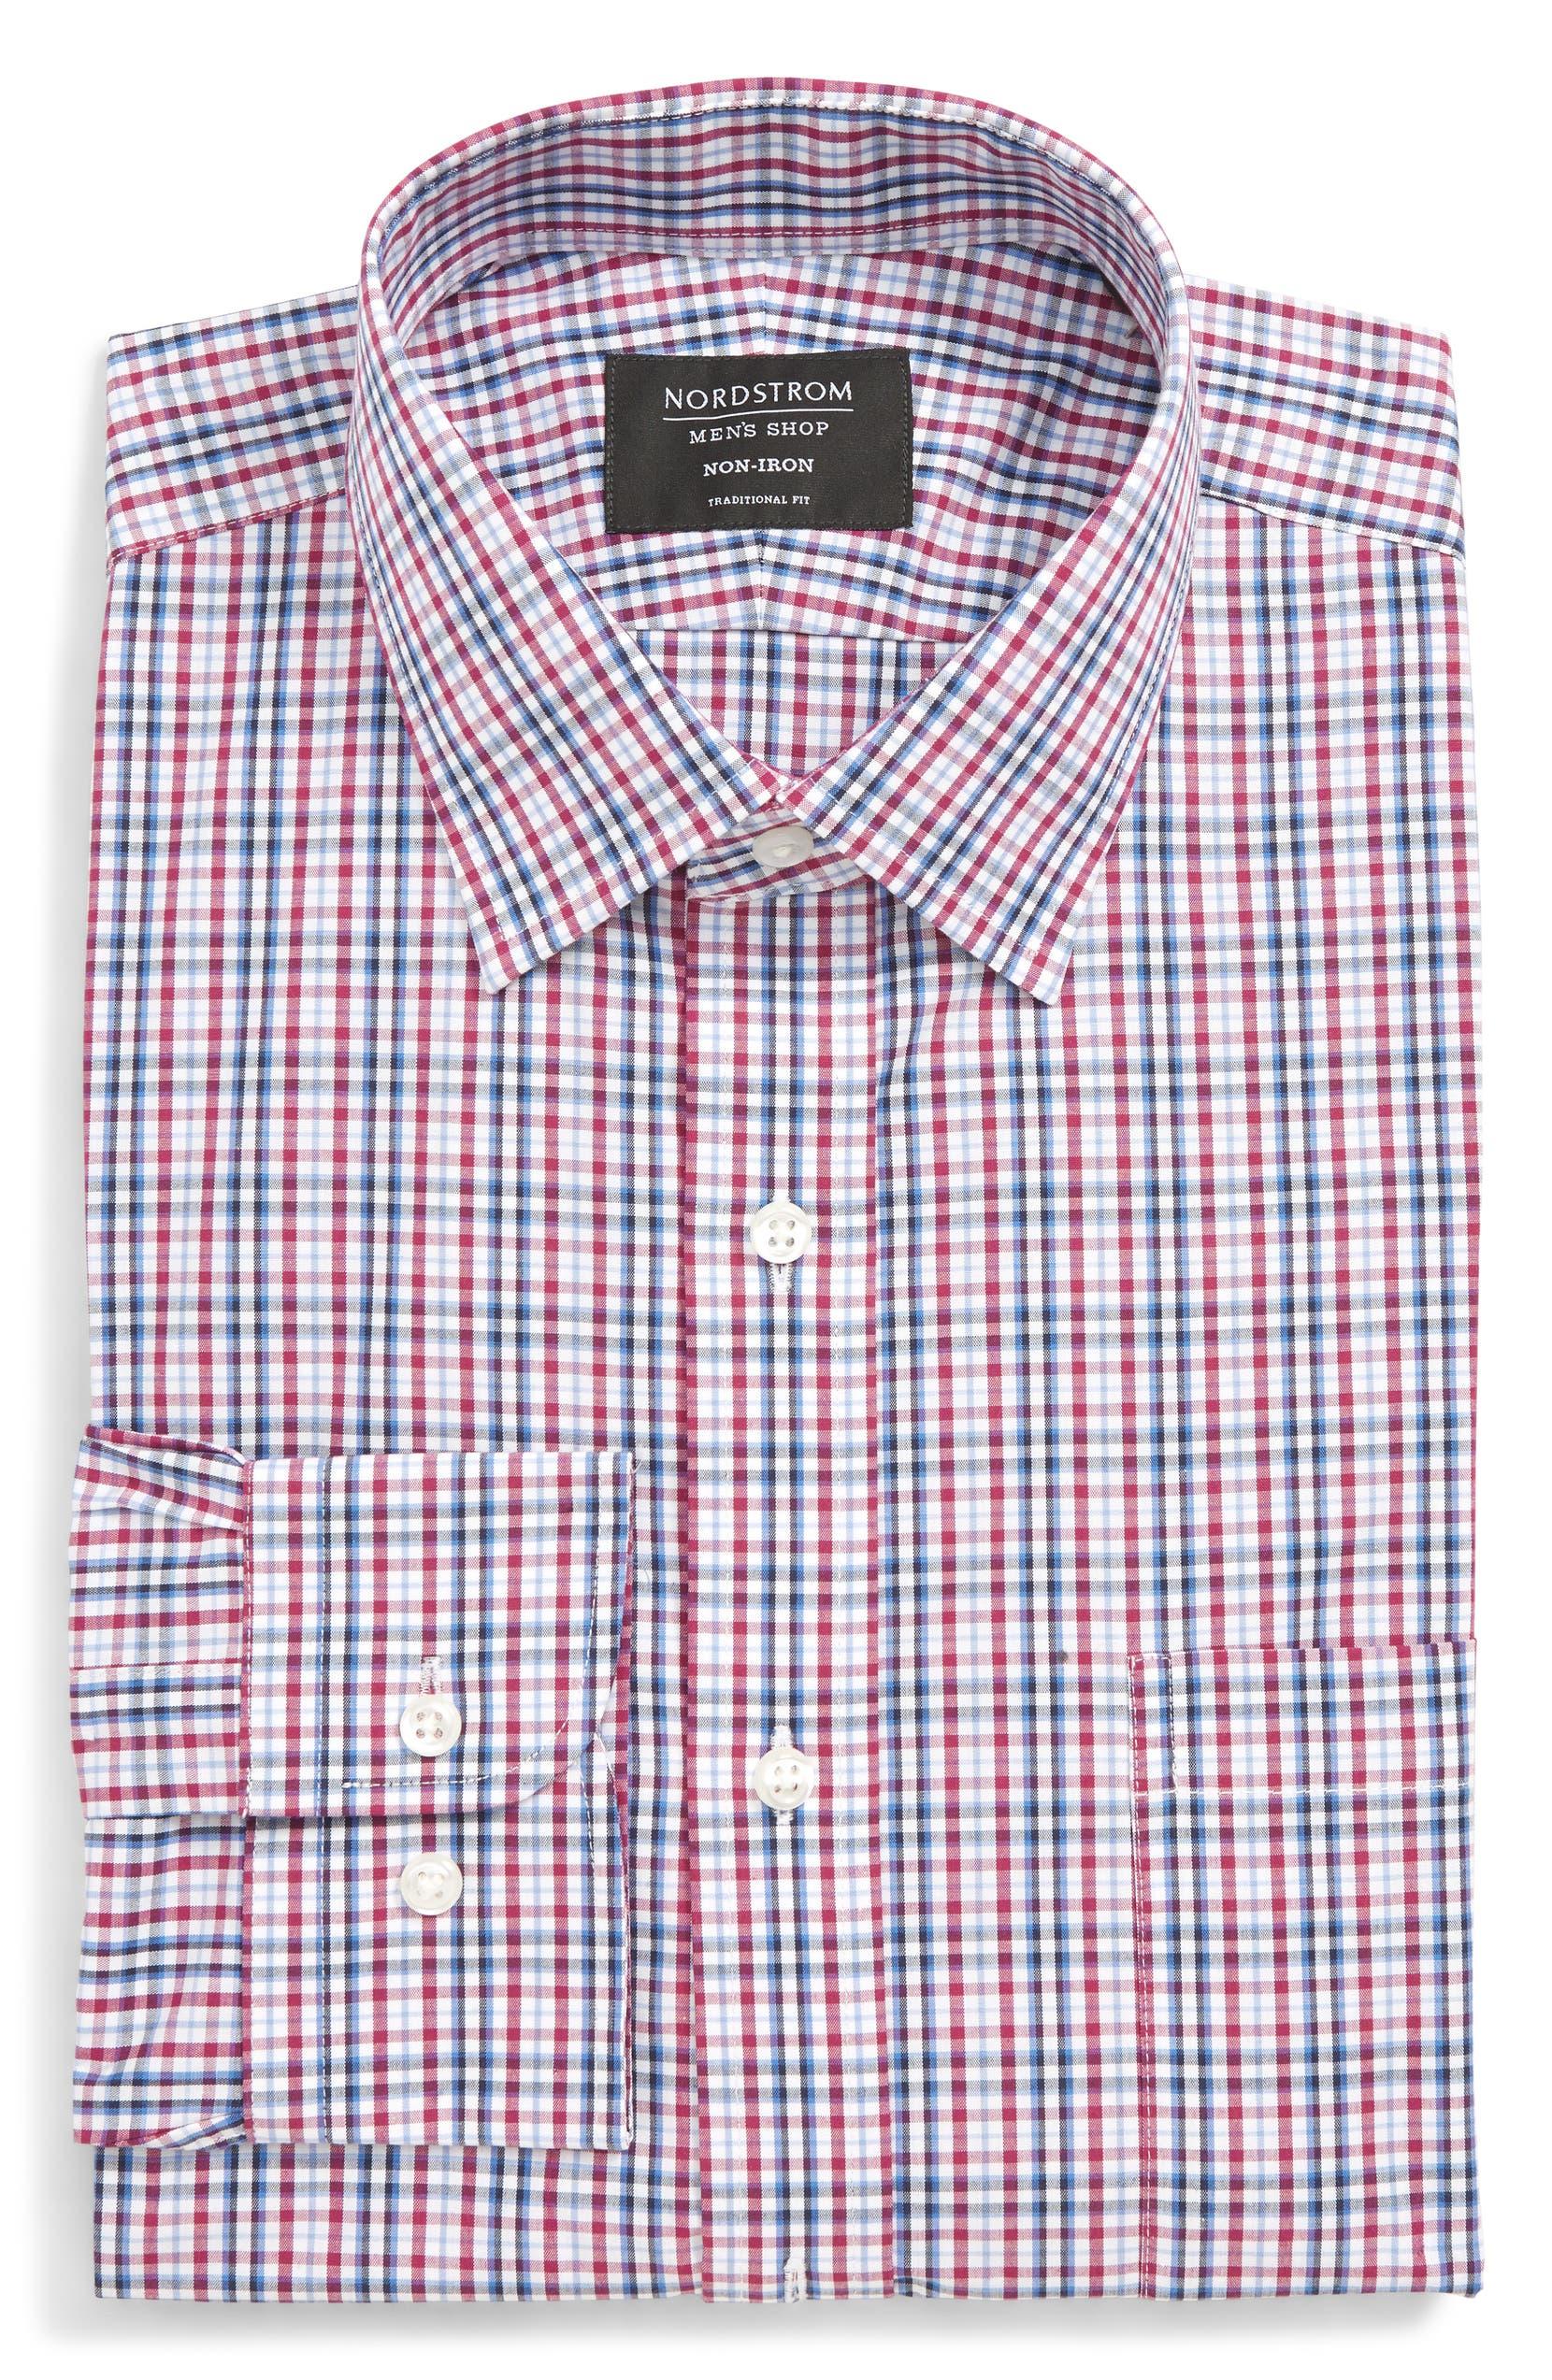 1f2e3c6c07b57 Nordstrom Men s Shop Traditional Fit Non-Iron Plaid Dress Shirt ...